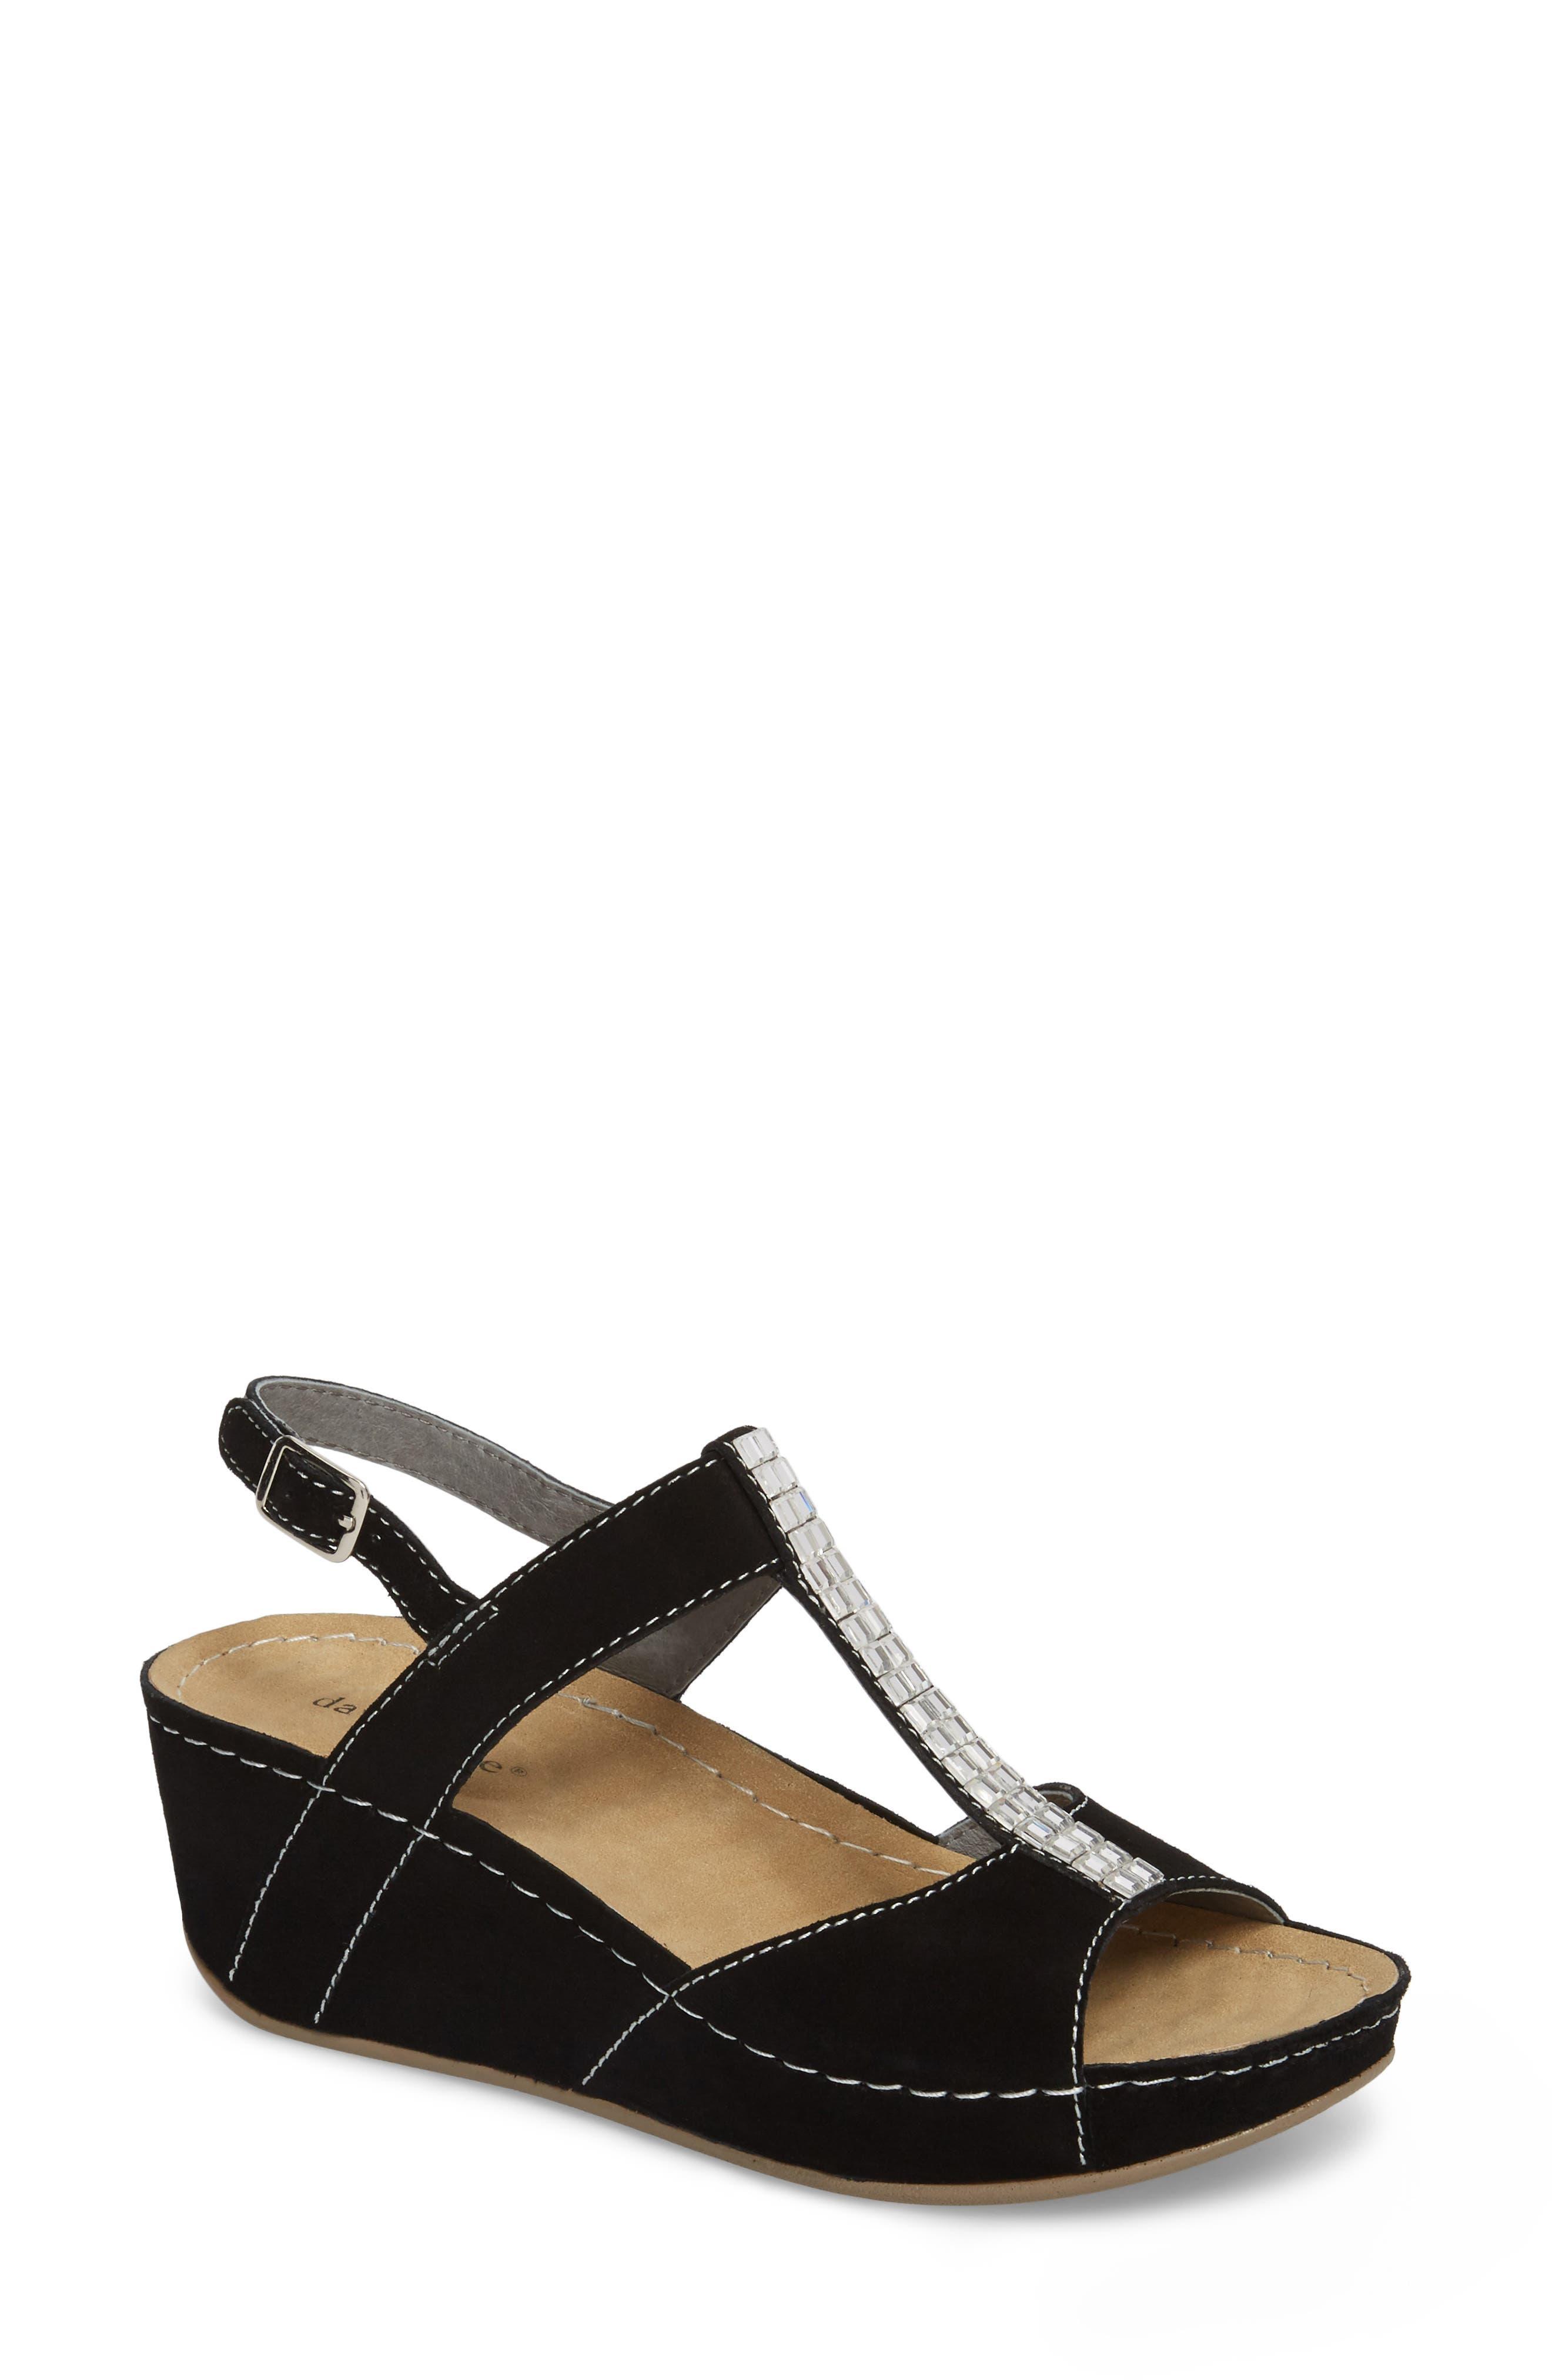 DAVID TATE Bubbly Embellished T-Strap Wedge Sandal, Main, color, BLACK SUEDE